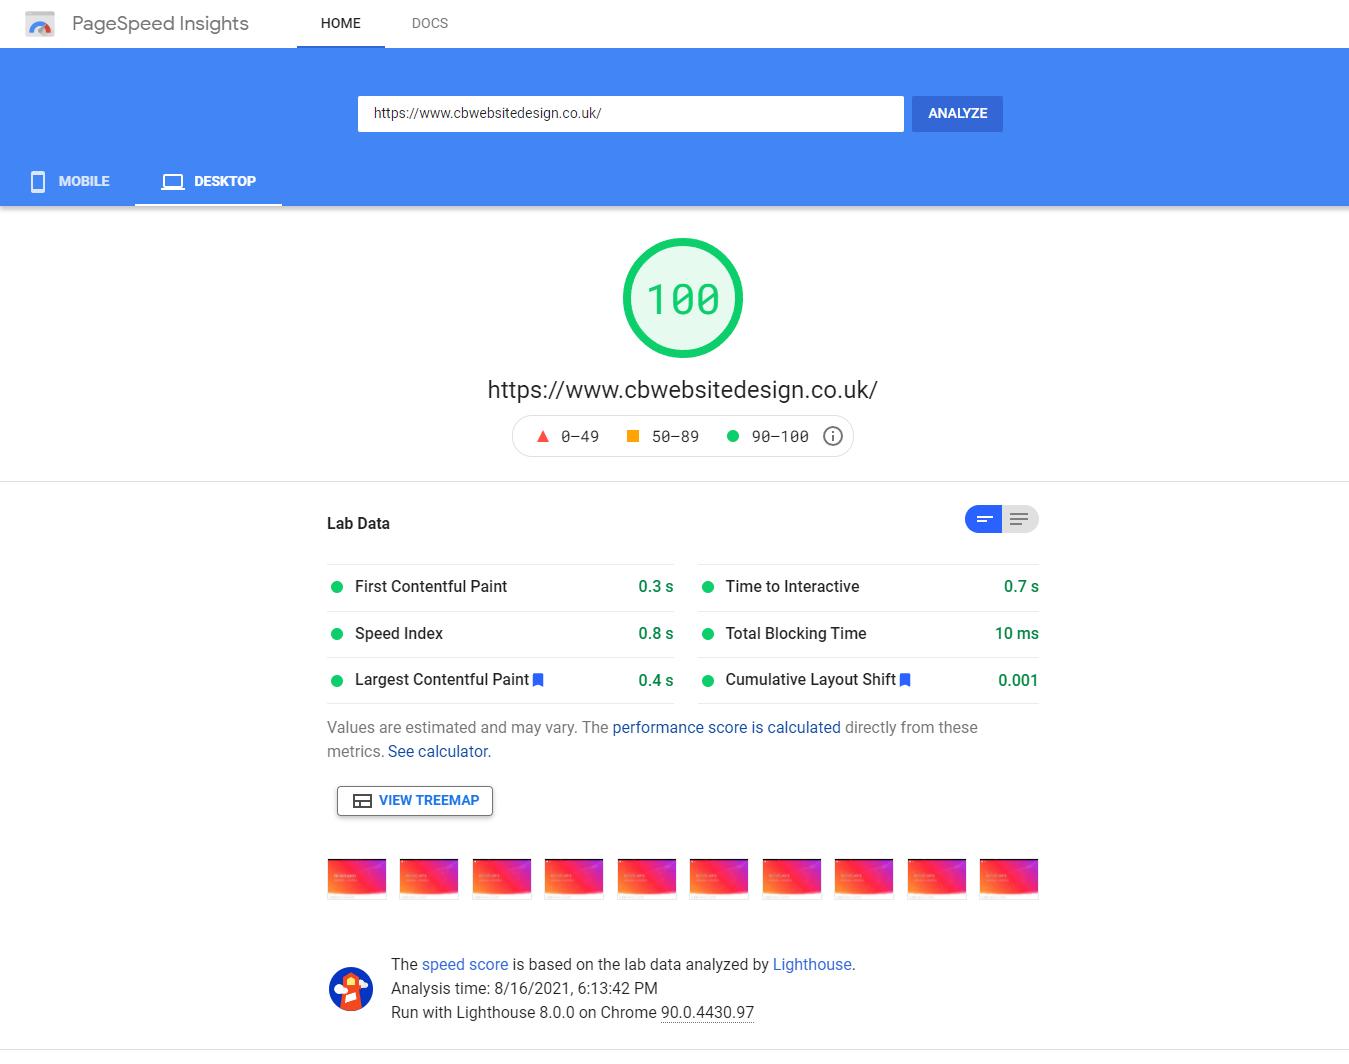 Creative Brand Design - PageSpeed Score of 100